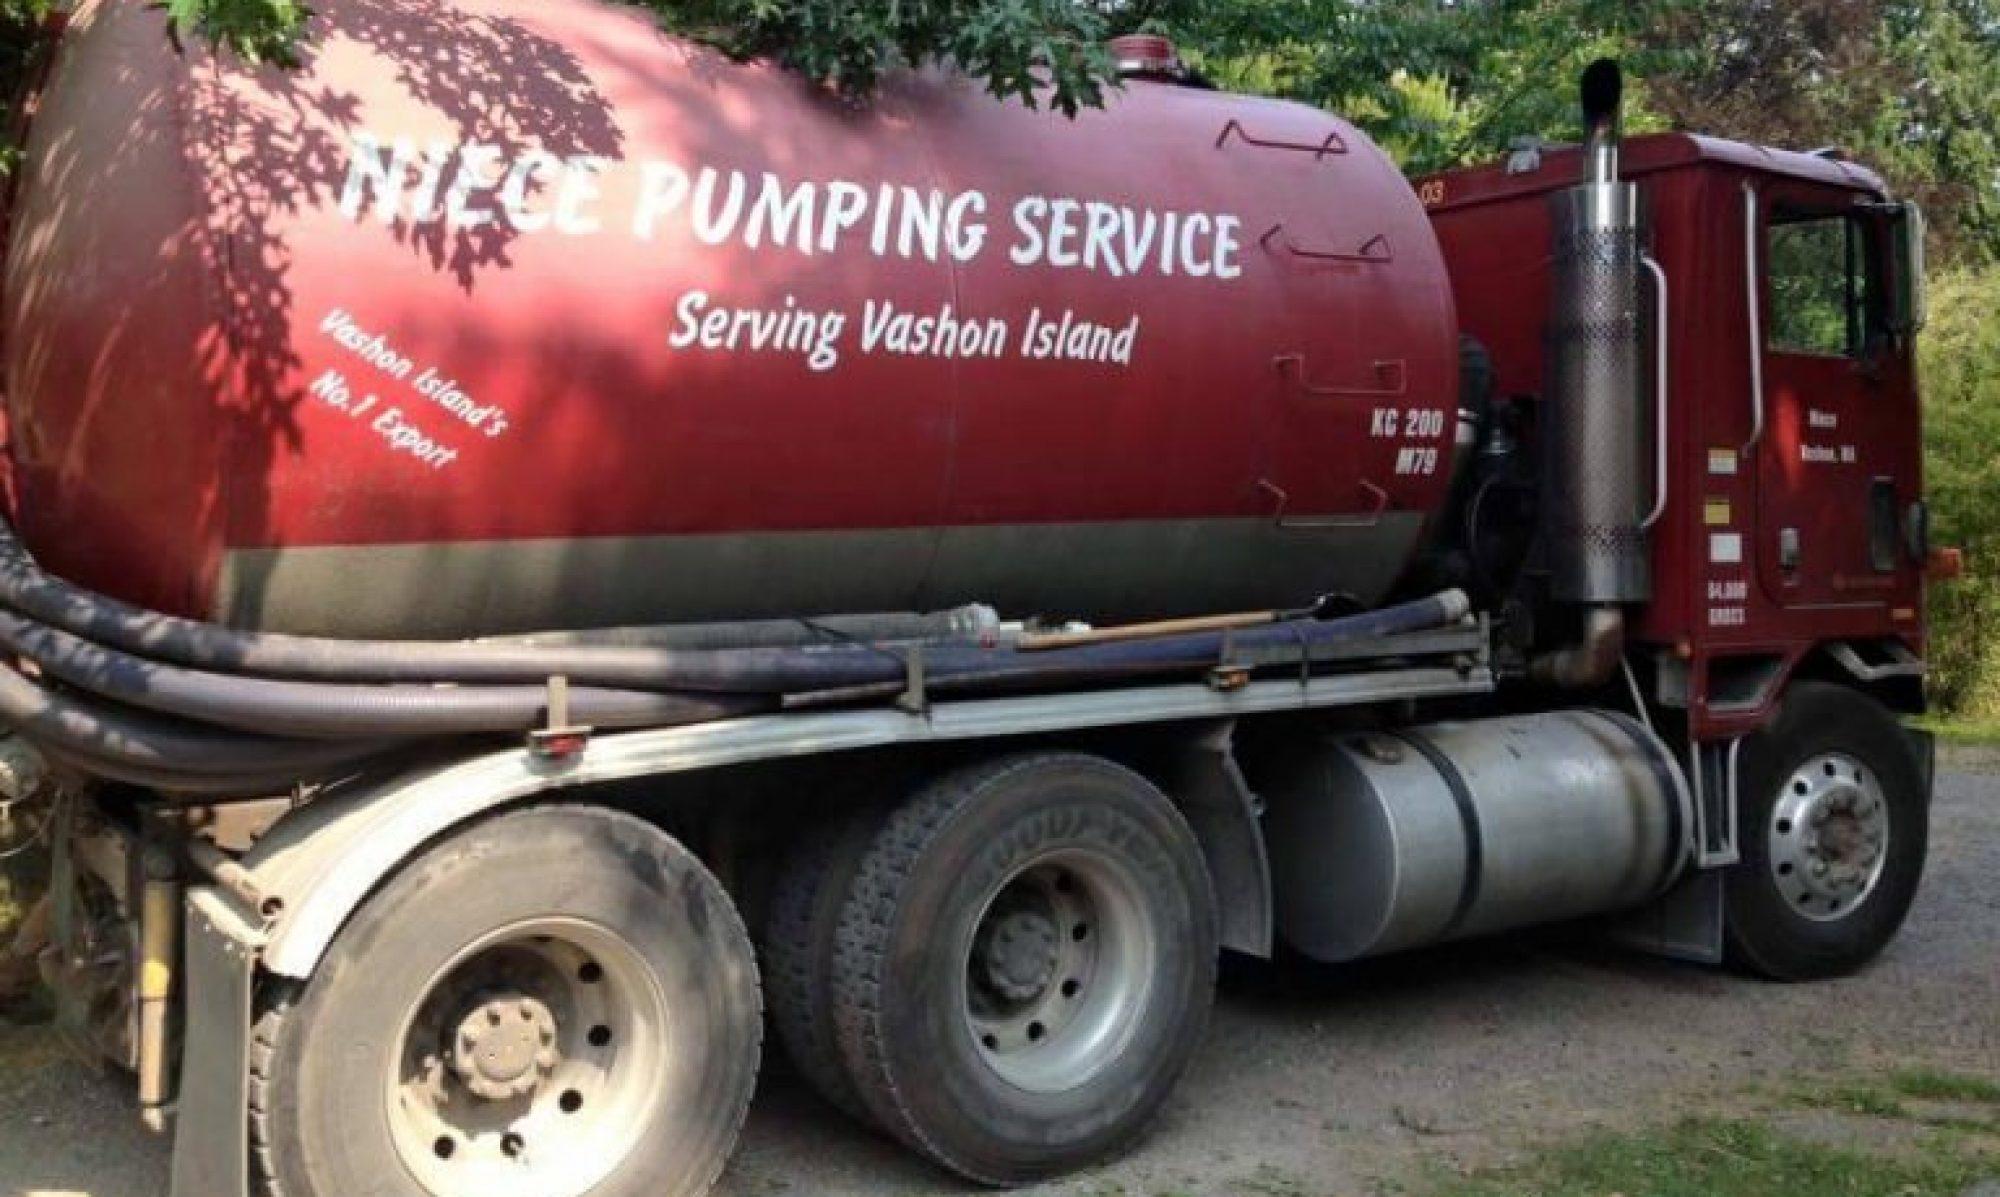 Niece Pumping